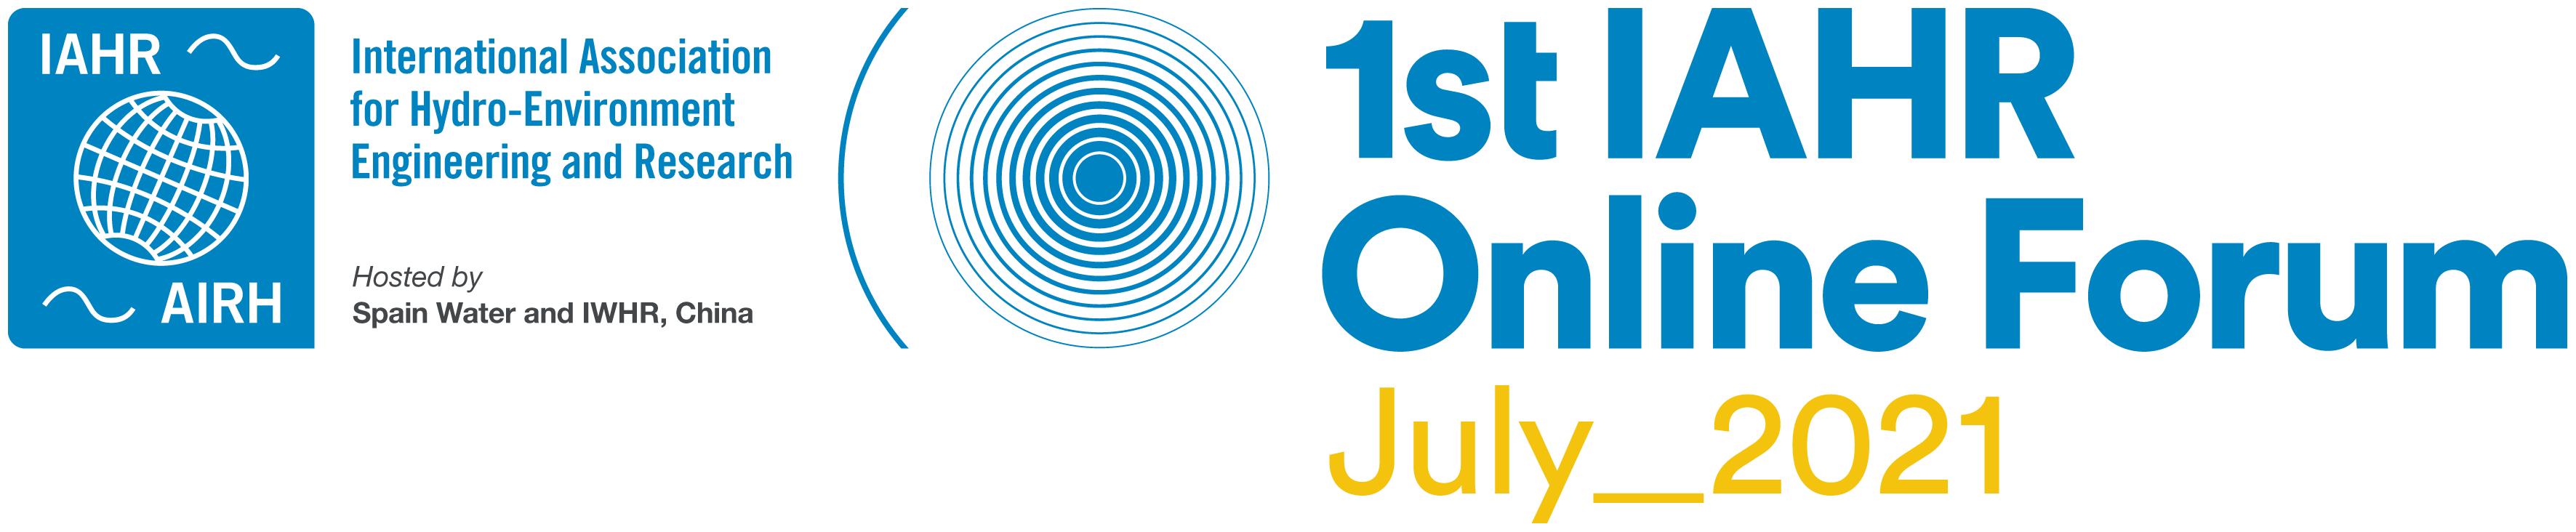 1st  IAHR Online Forum: Digital Transformation of Urban Water Systems